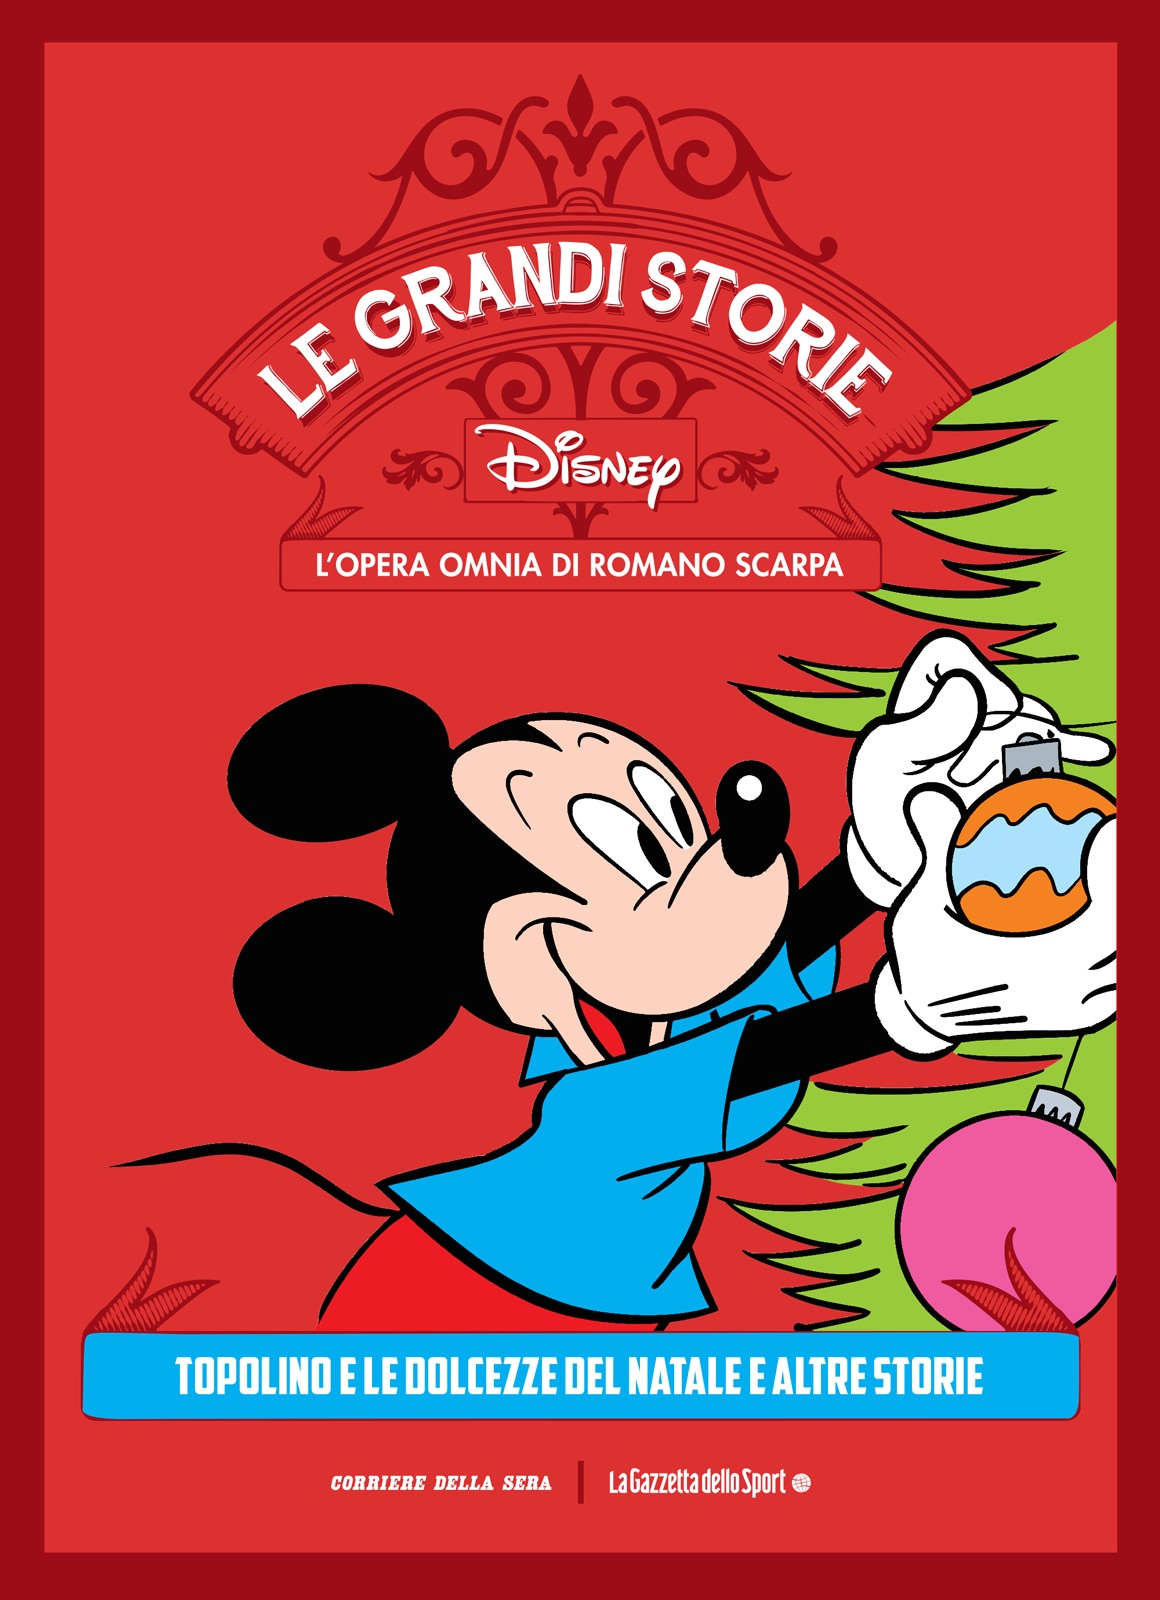 Cover Le grandi storie Disney 50